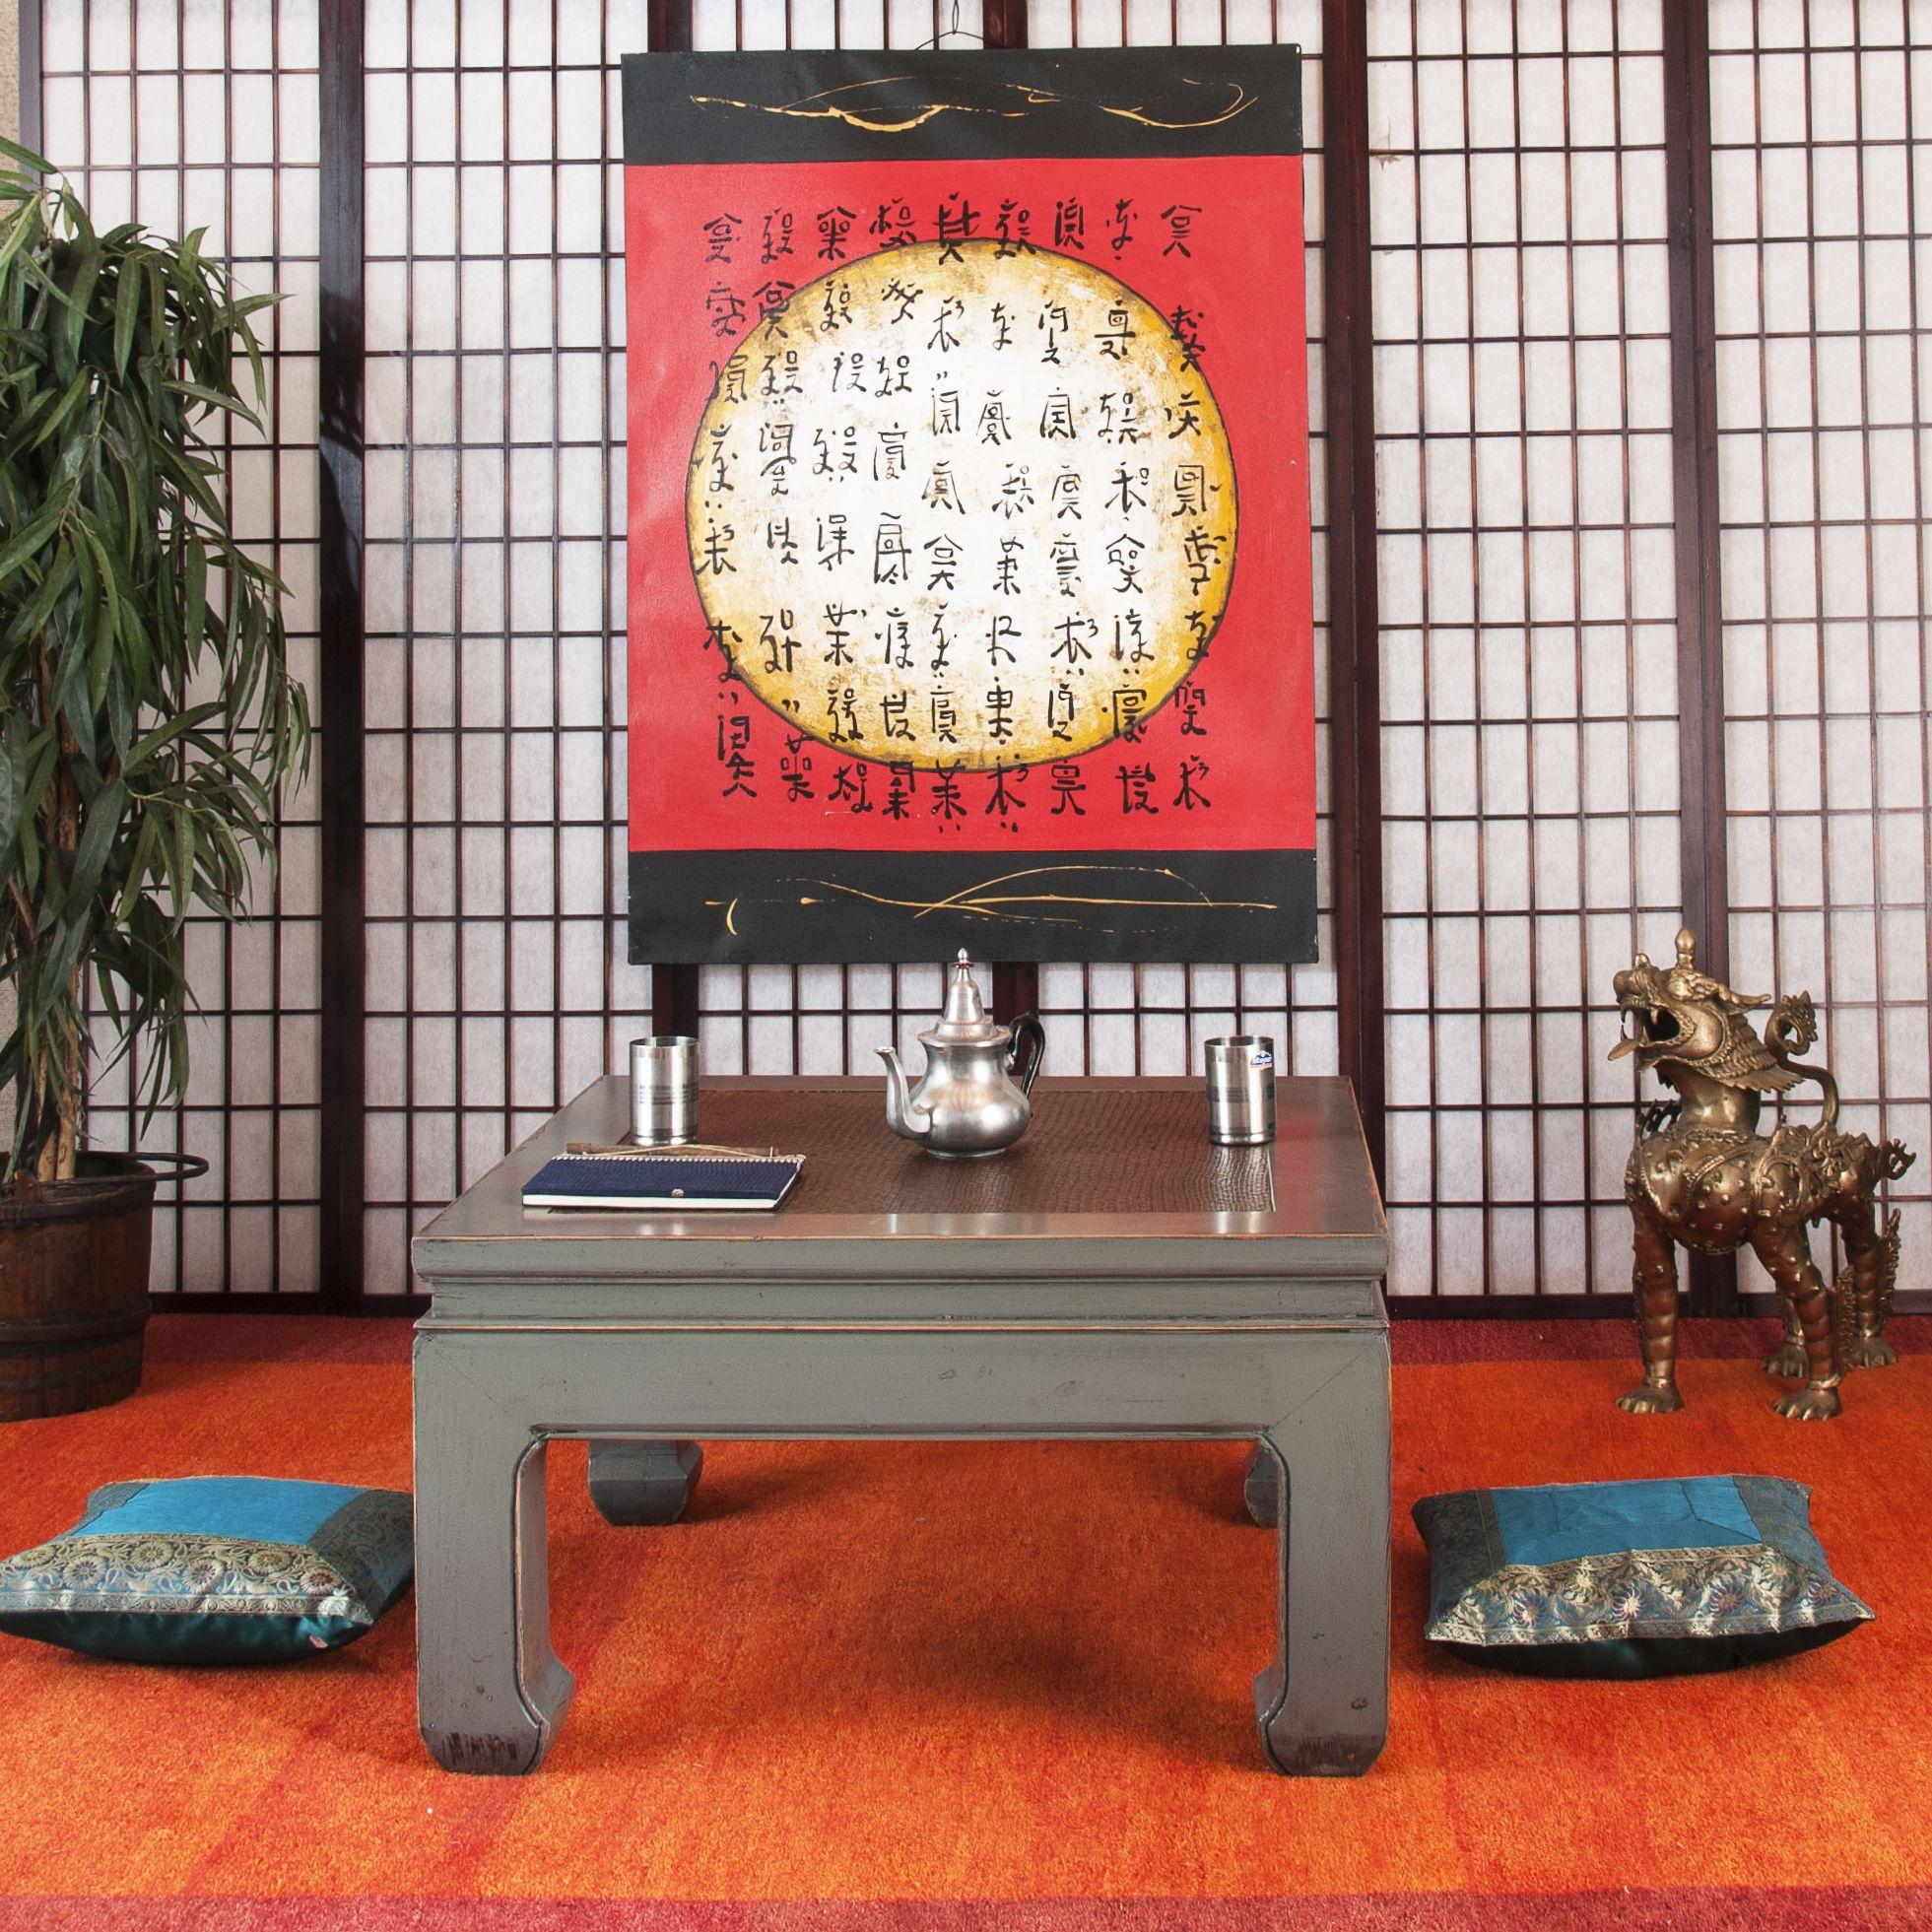 2a89404ead62b62f83c01664bdce3238 Luxe De Mini Table Basse Concept